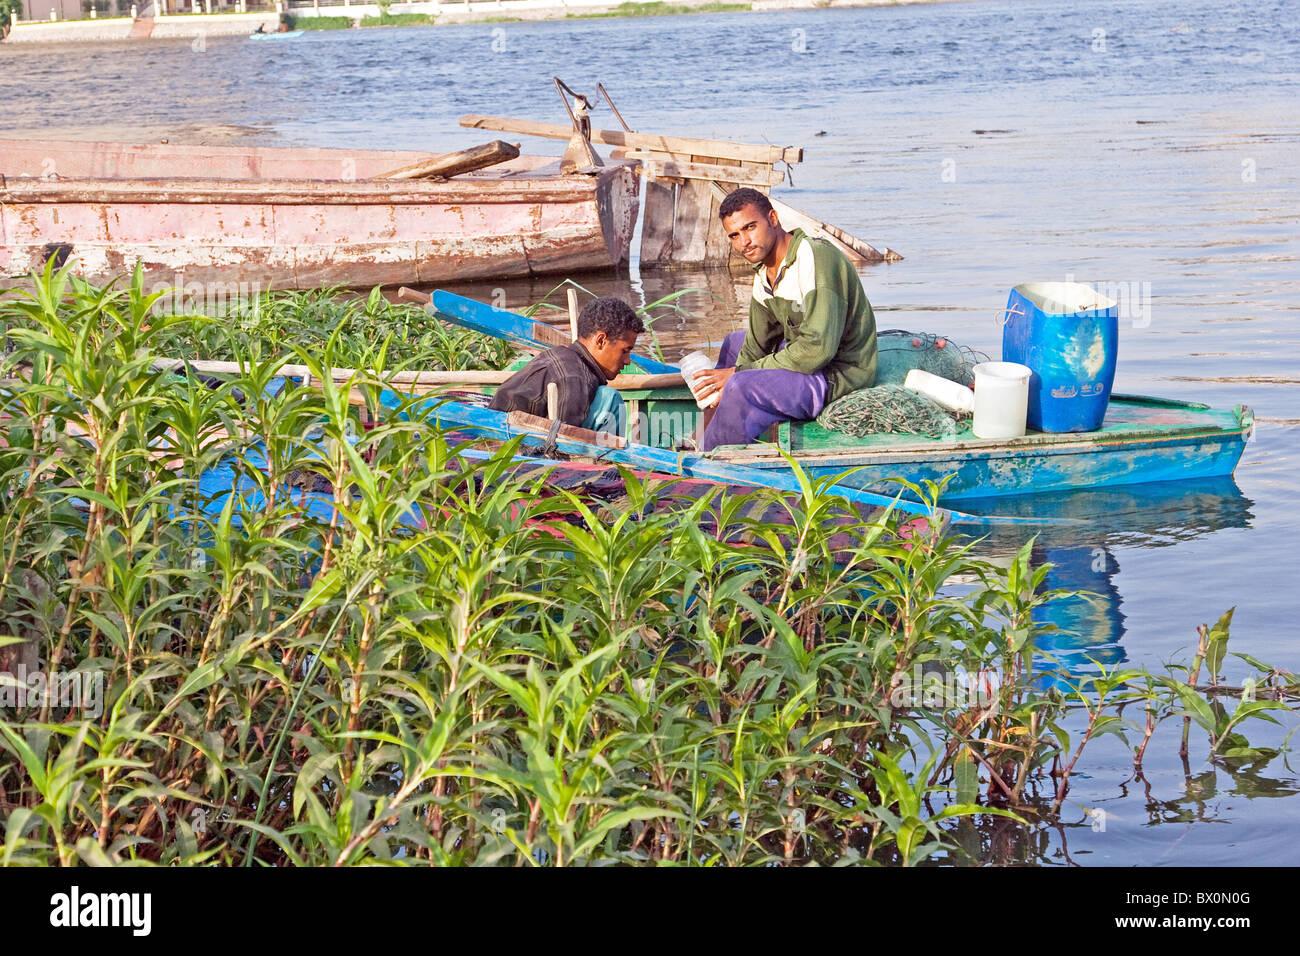 Fisher men at Nile River, Giza, Egypt - Stock Image